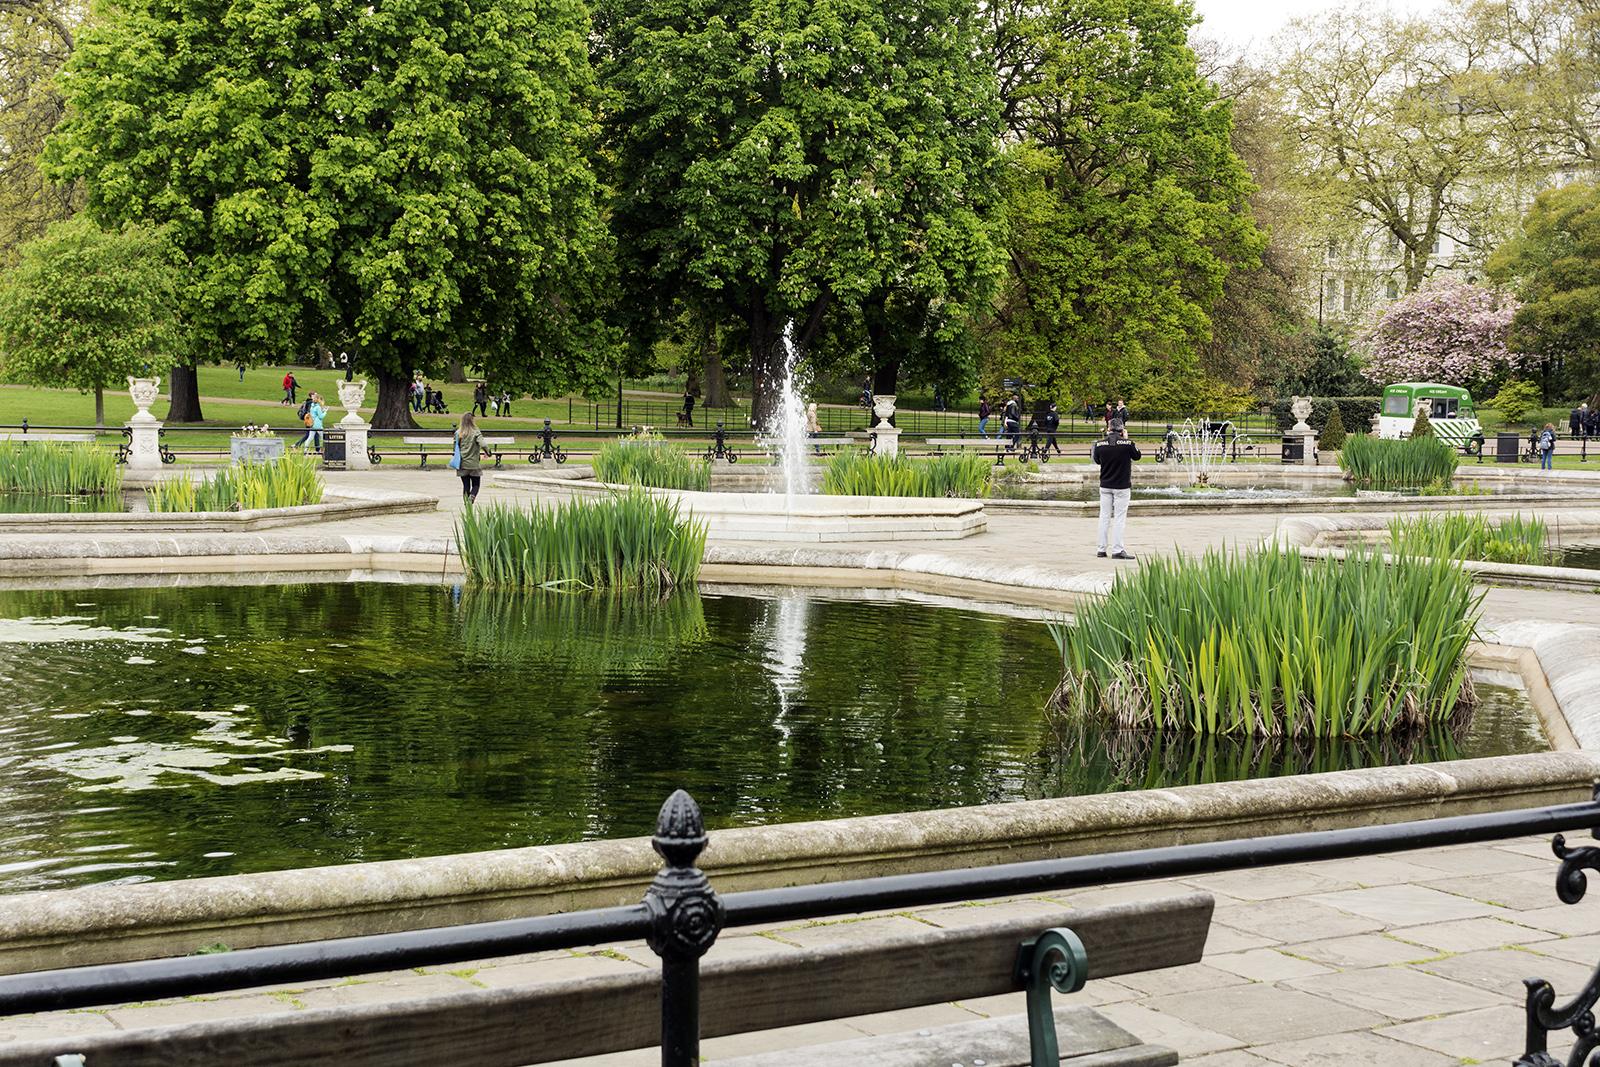 20147-04-17-Hyde-Park_Kensington-Gardens_Spring_Landscape-View-across-the-gardens